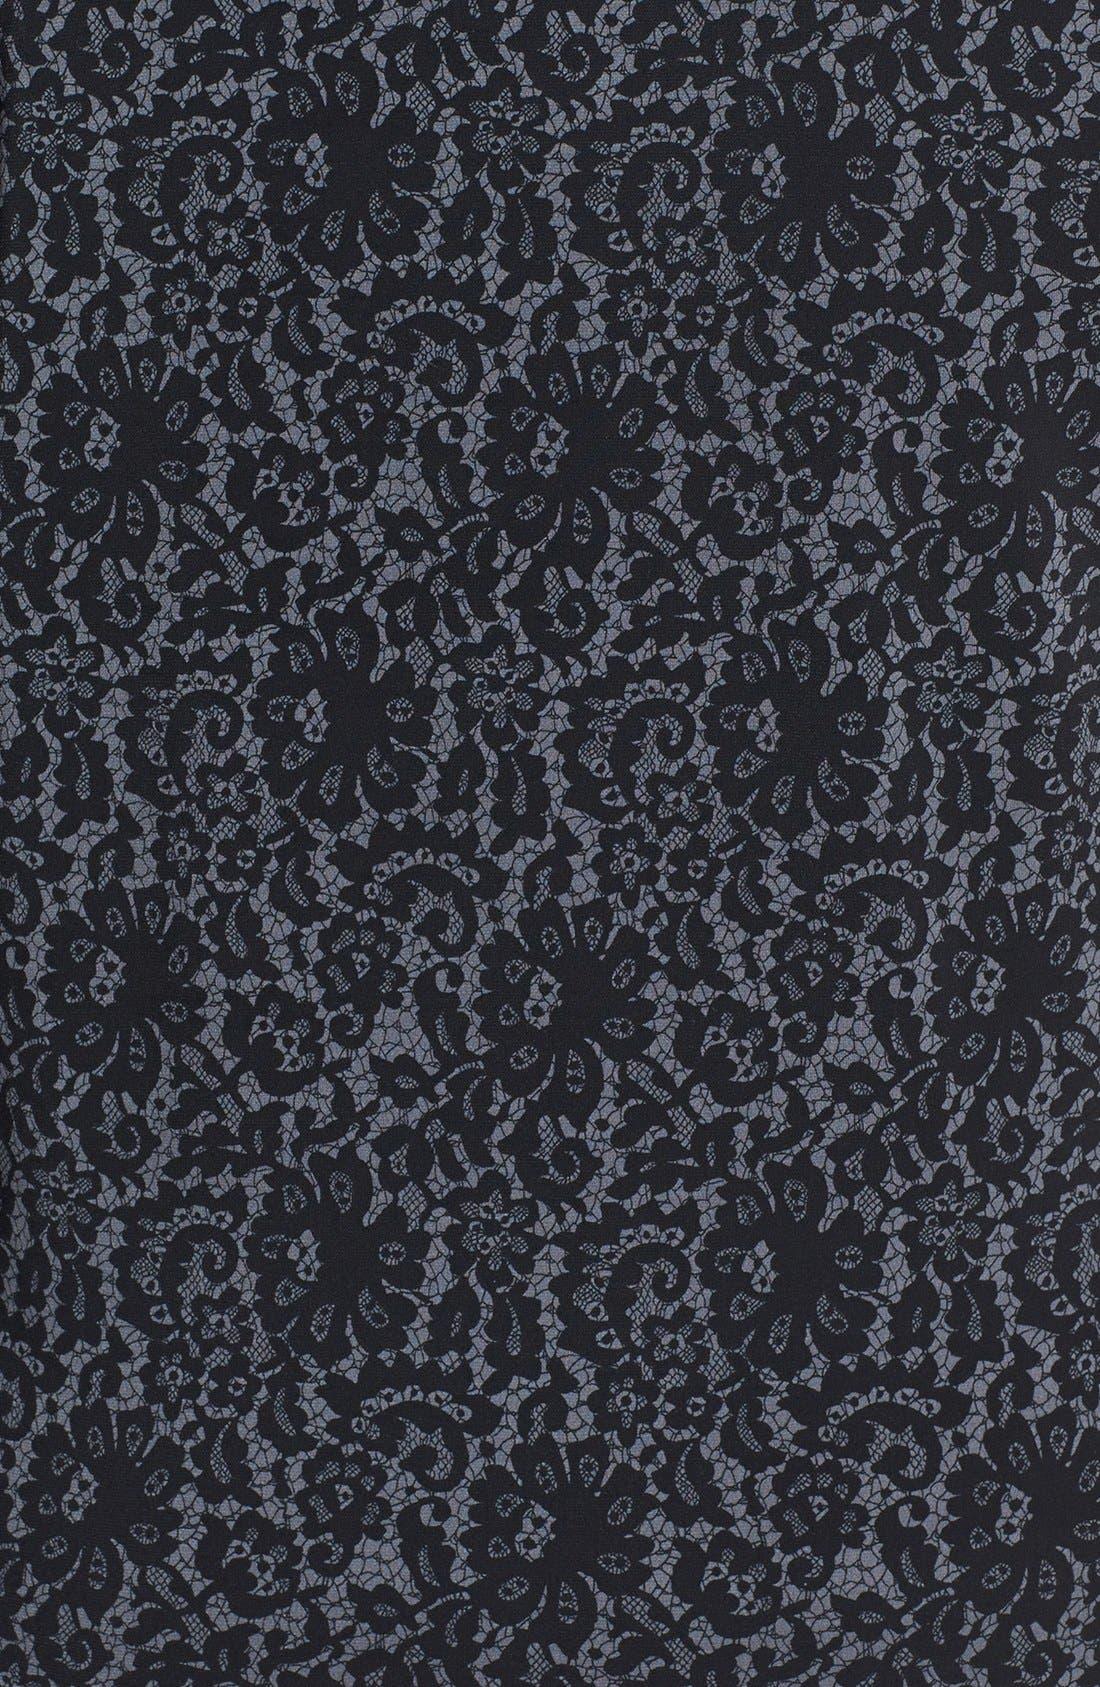 Alternate Image 3  - Vince Camuto 'Chantilly' Lace Print V-Neck Top (Plus Size)